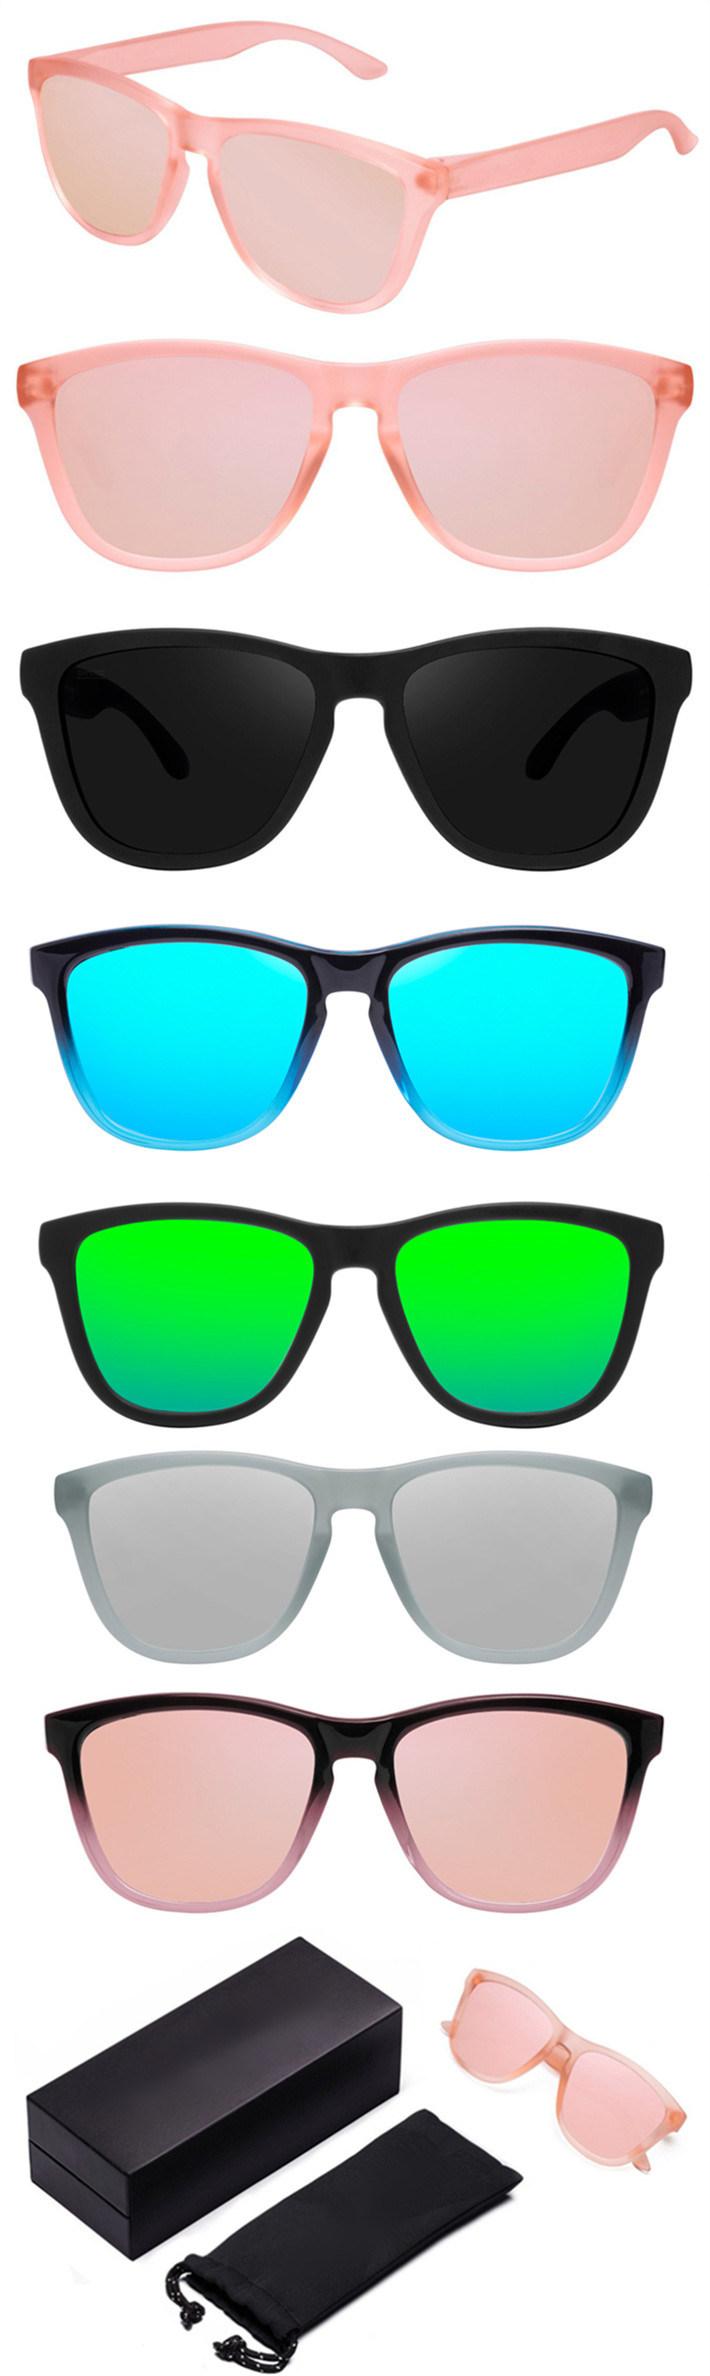 0b2e6c4af8c Custom Logo PC Frame Polarized Sunglasses 100% UV Protection - China ...